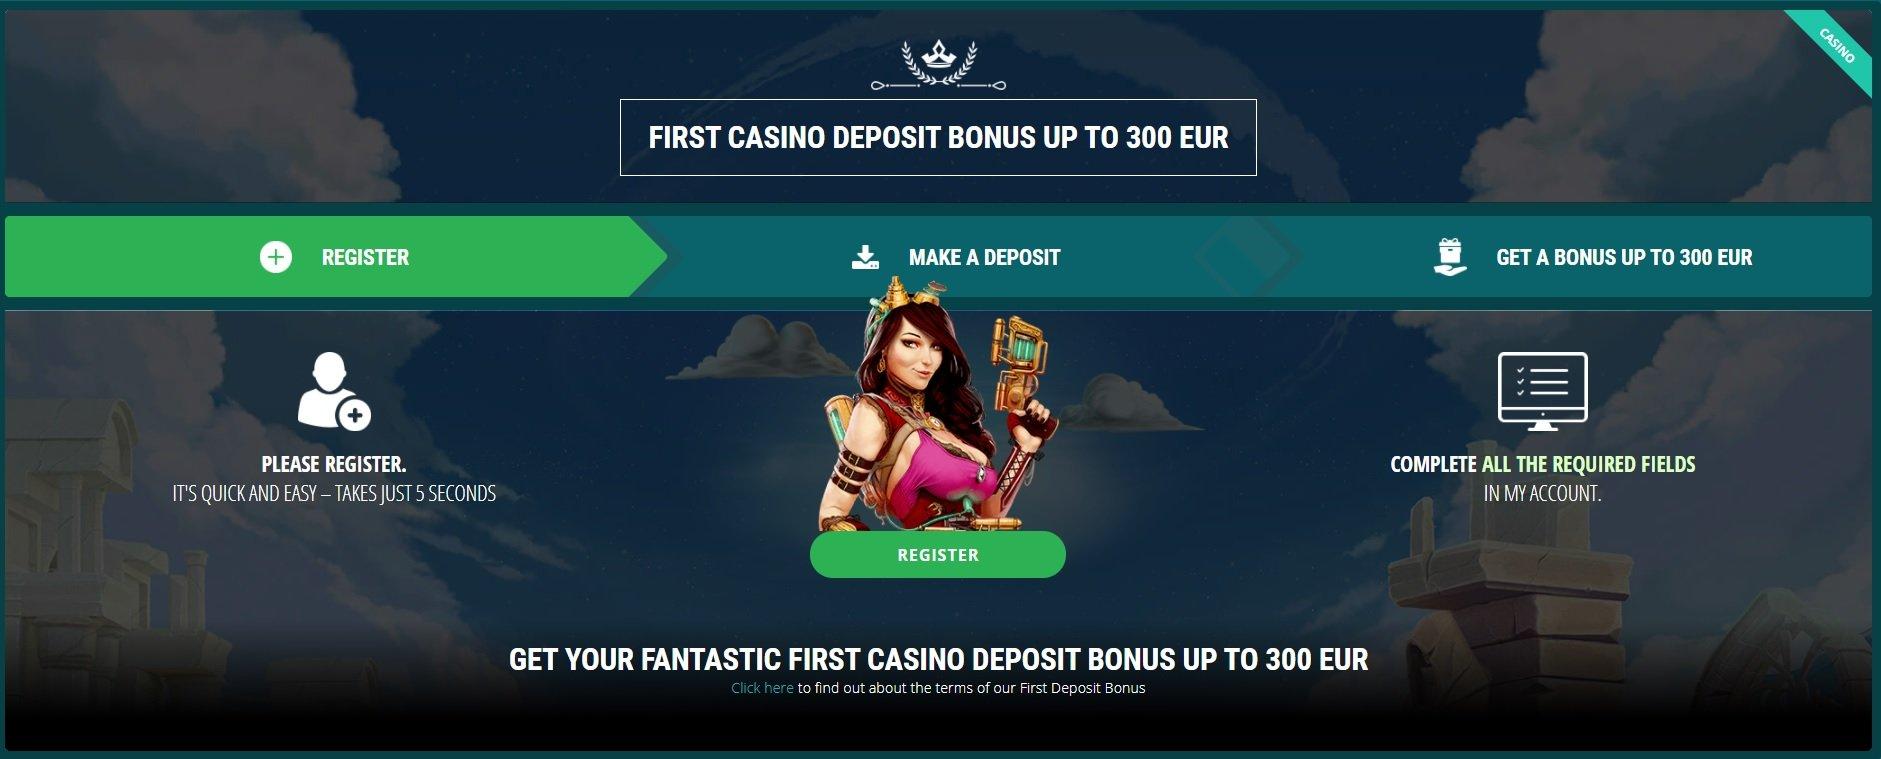 22Bet casino sign up bonus for first deposit.